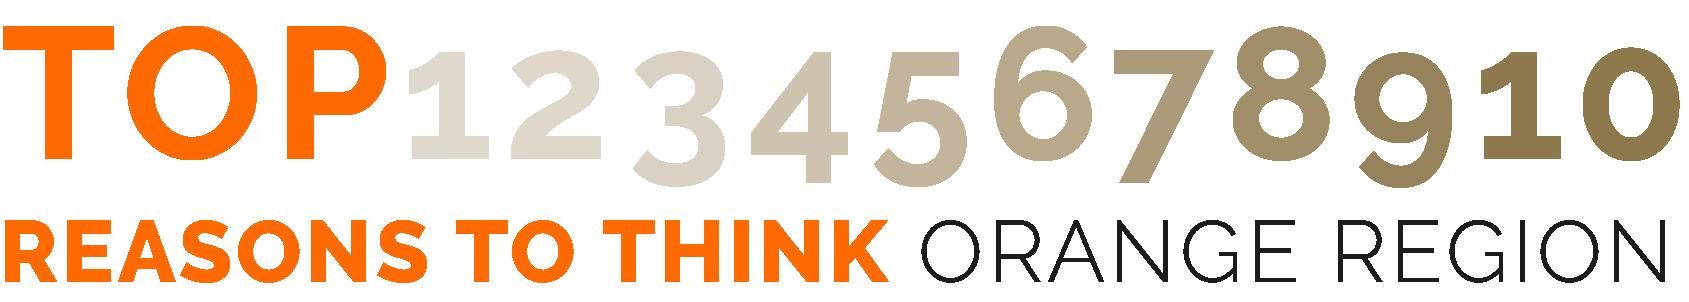 Top Ten Reasons To Think Orange Region